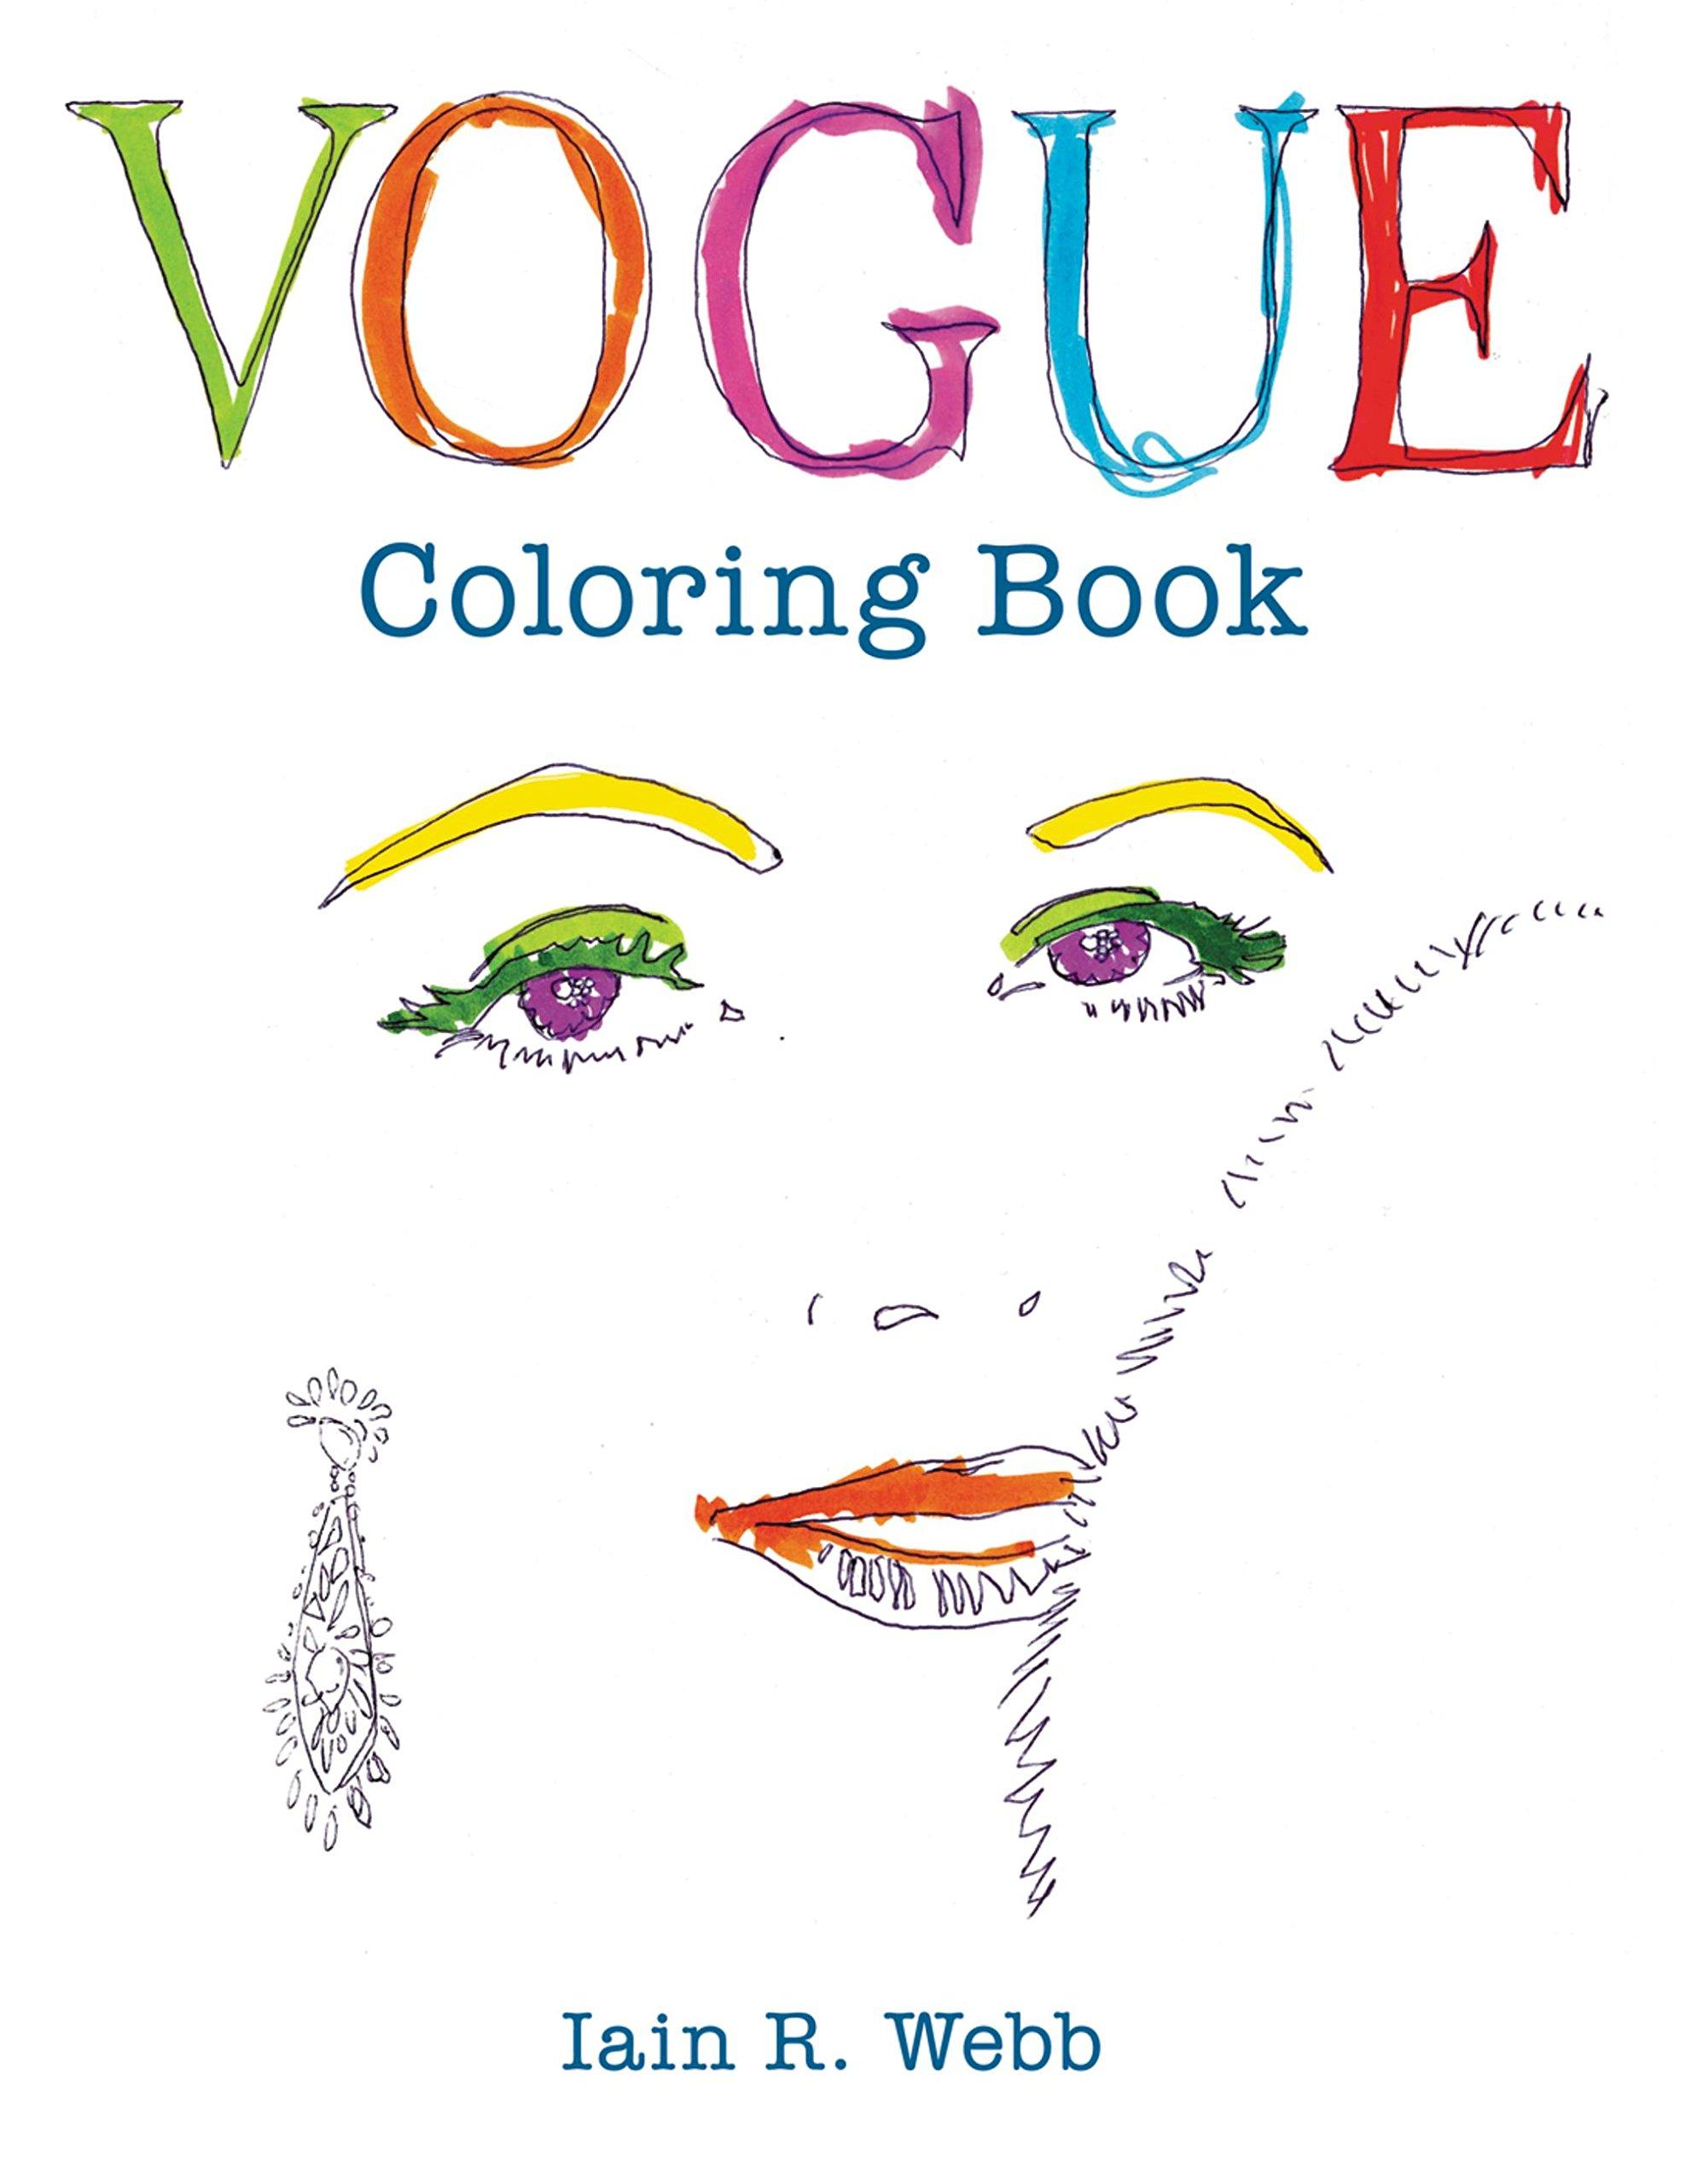 Vogue Coloring Book British Vogue Webb Iain R 9781840917260 Amazon Com Books